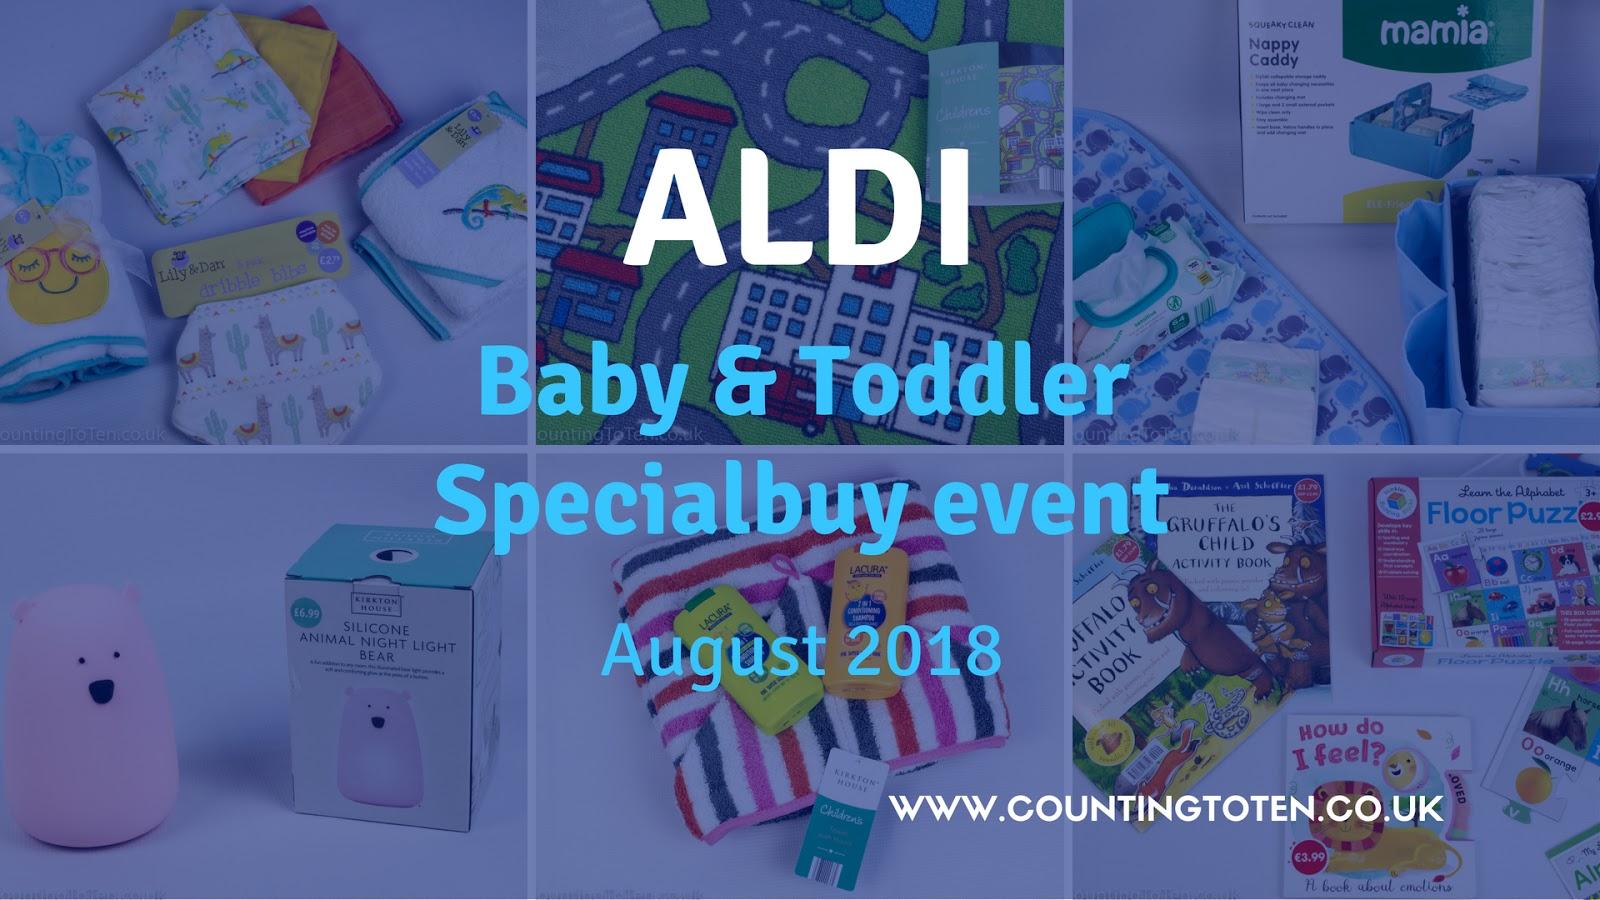 the aldi baby toddler specialbuy event august 2018. Black Bedroom Furniture Sets. Home Design Ideas